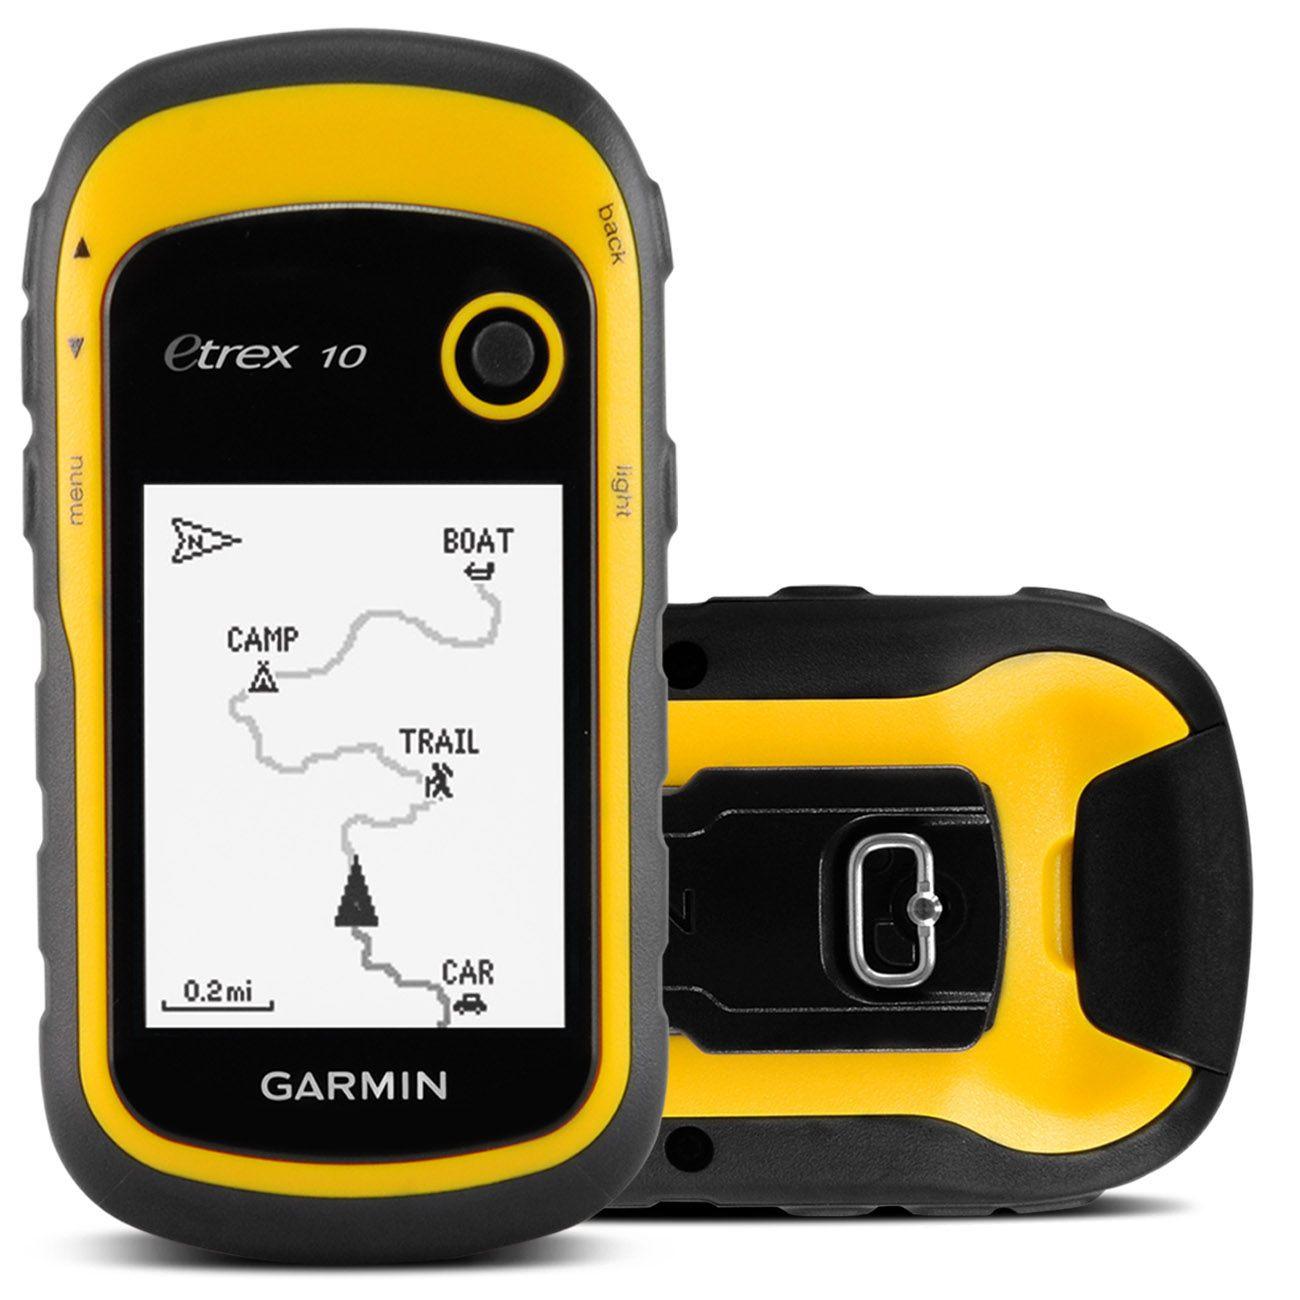 GPS Portátil Garmin 2.2 Polegadas GLONASS USB Trilha Aquático Amarelo eTrex 10